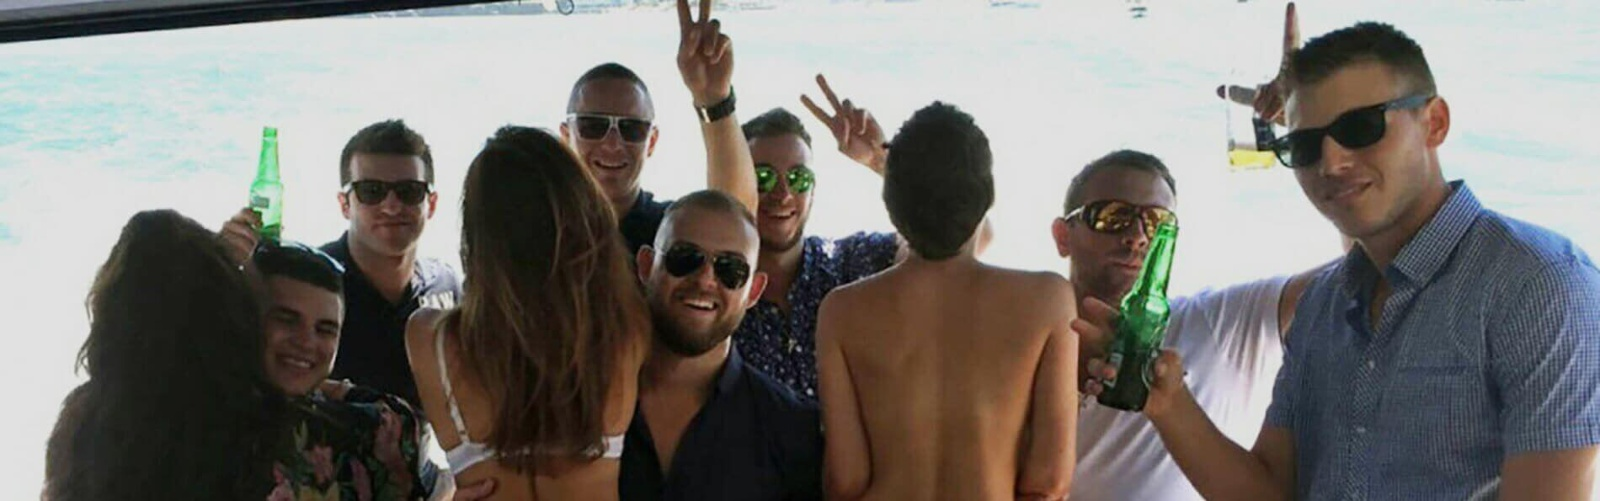 party cruise sydney dark